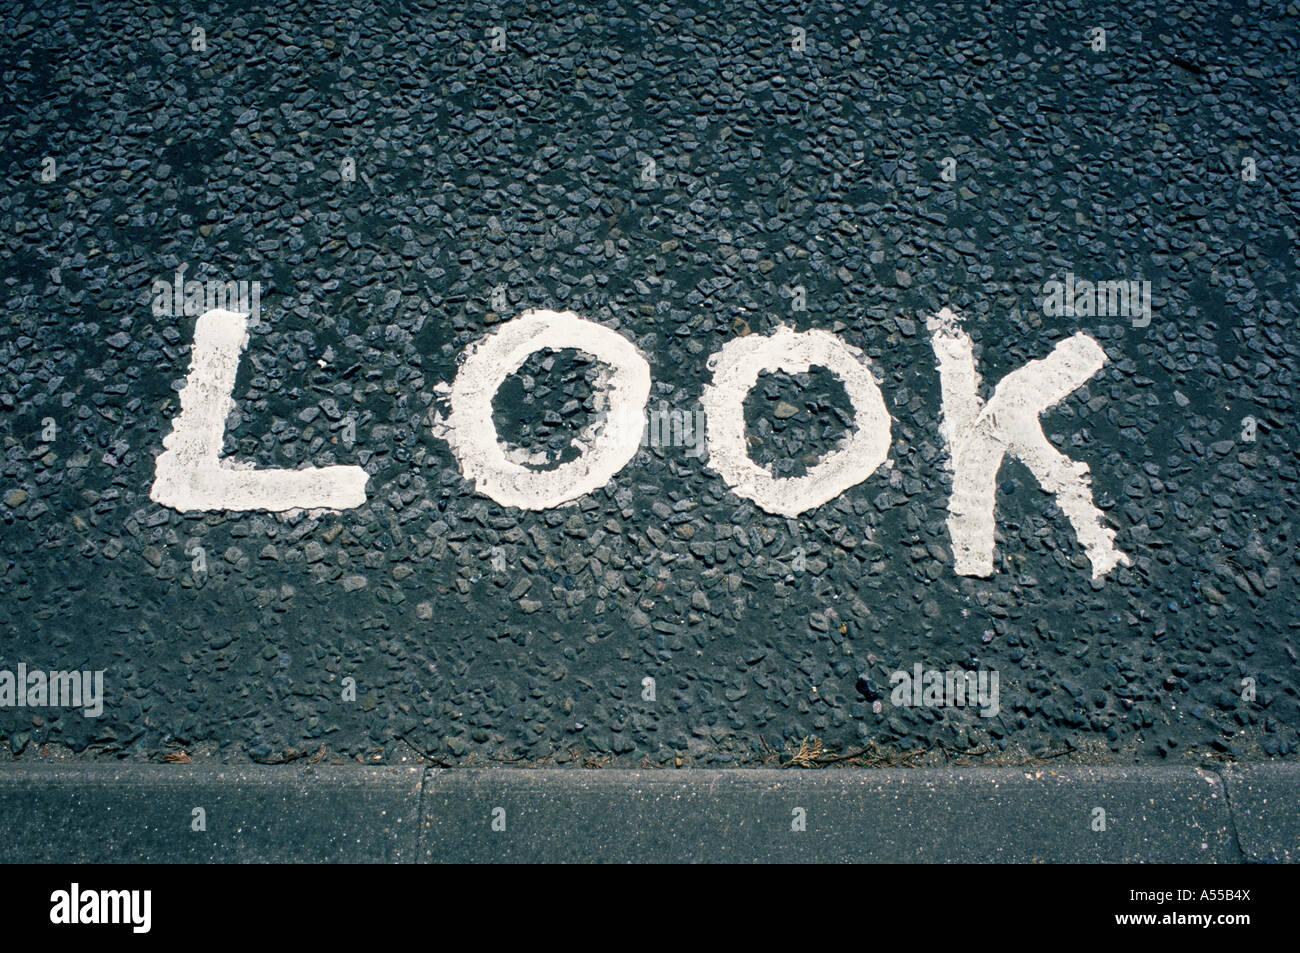 Look written on road - Stock Image